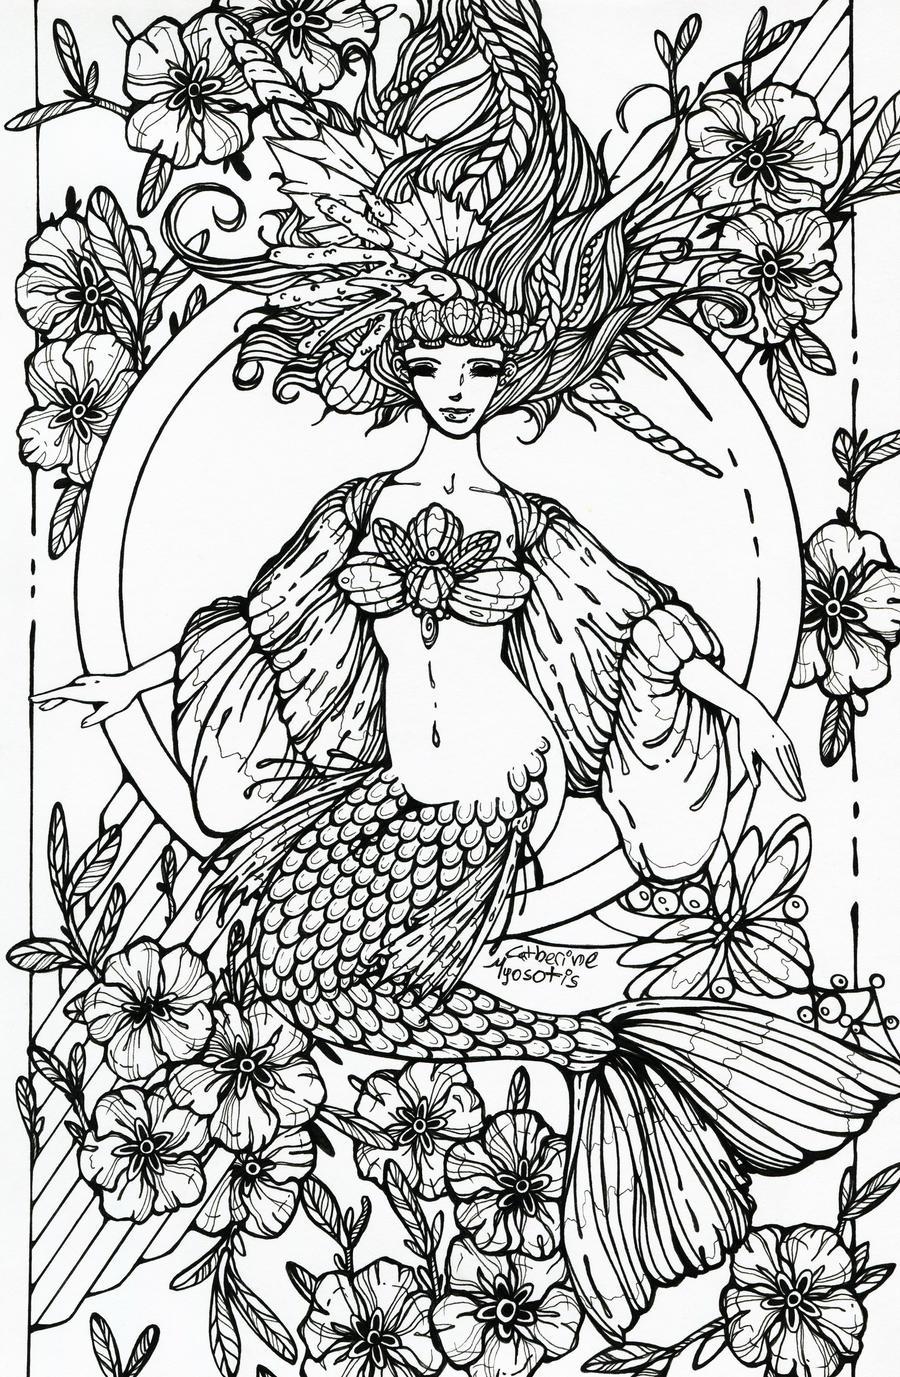 Megara Mermaid Line-attempt by TheRaineDrop on DeviantArt |Mermaid Line Drawing